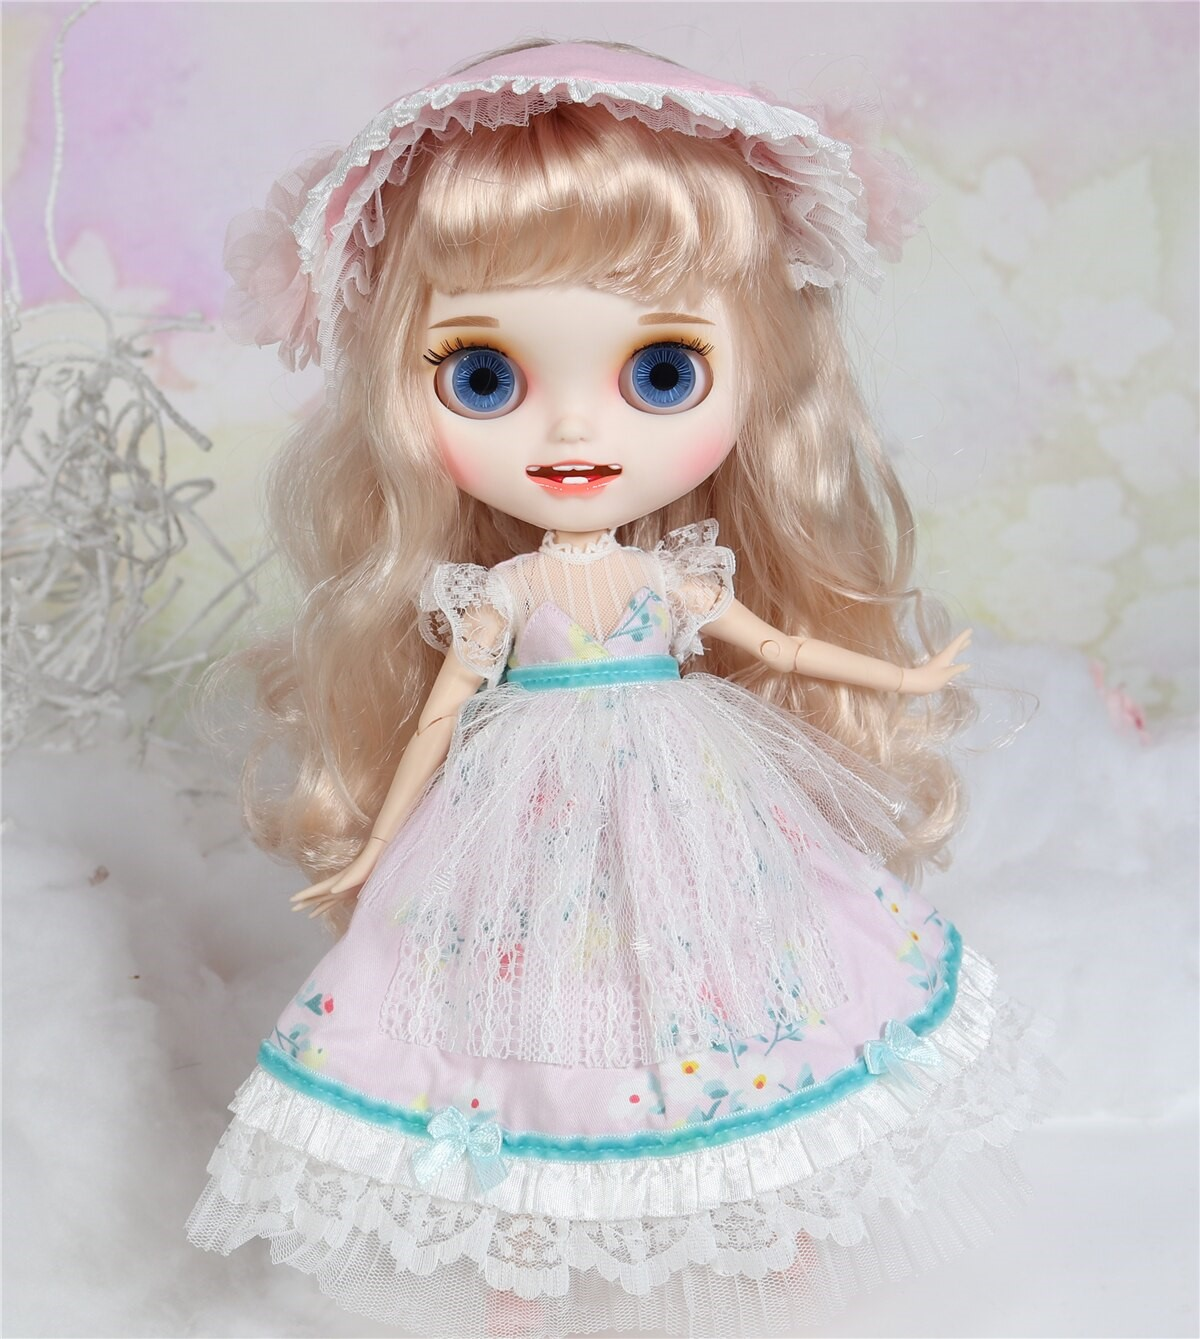 Millie – Premium Custom Blythe Doll with Clothes Smiling Face Premium Blythe Dolls 🆕 Smiling Face